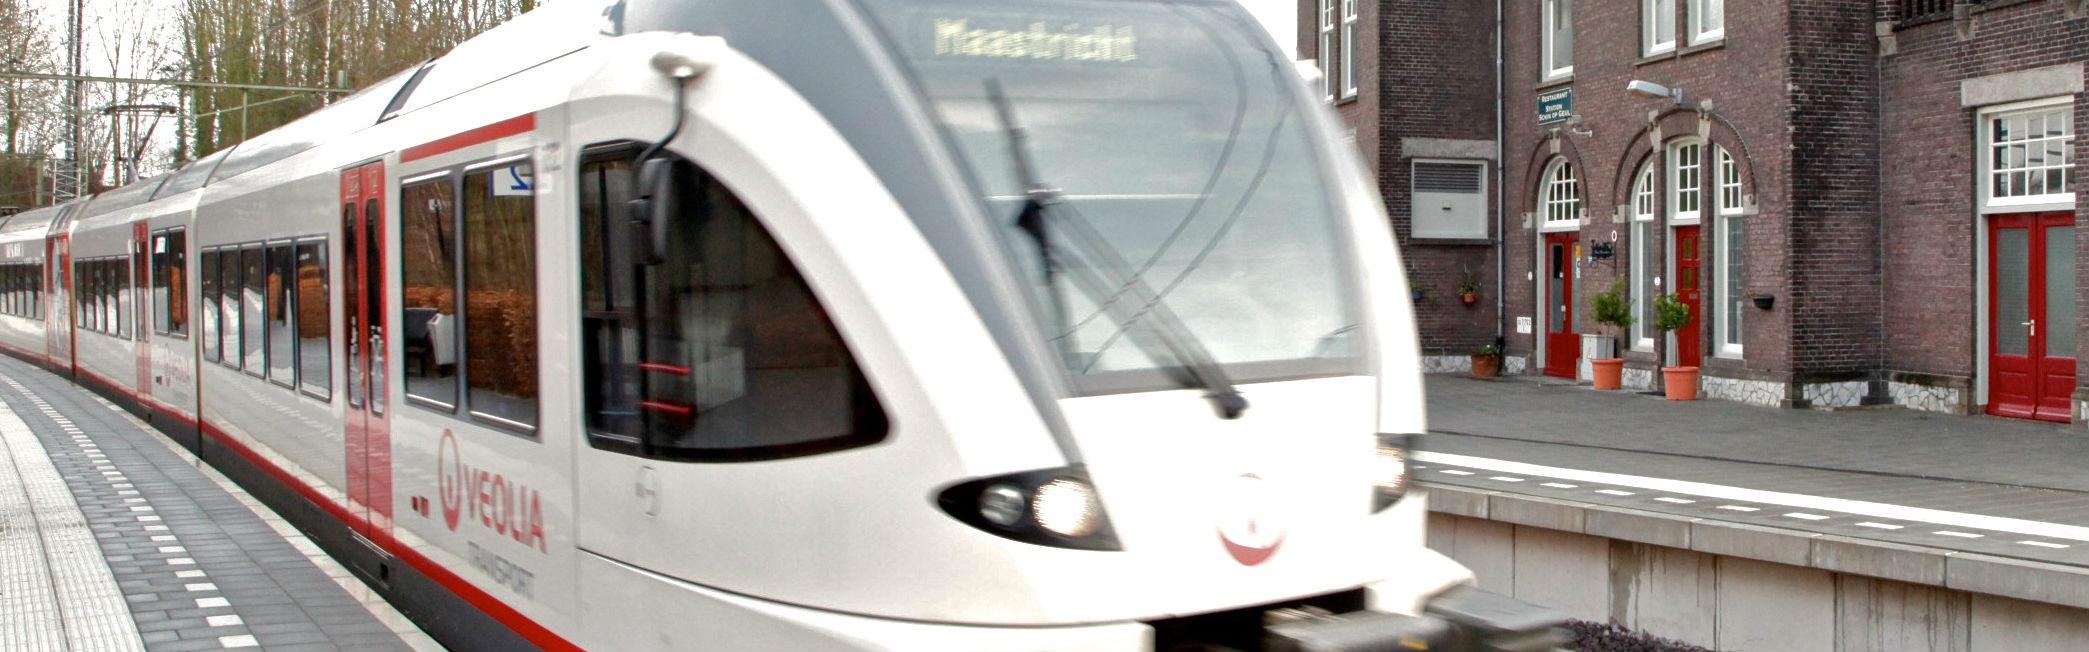 Veolia transport lim3burg 1